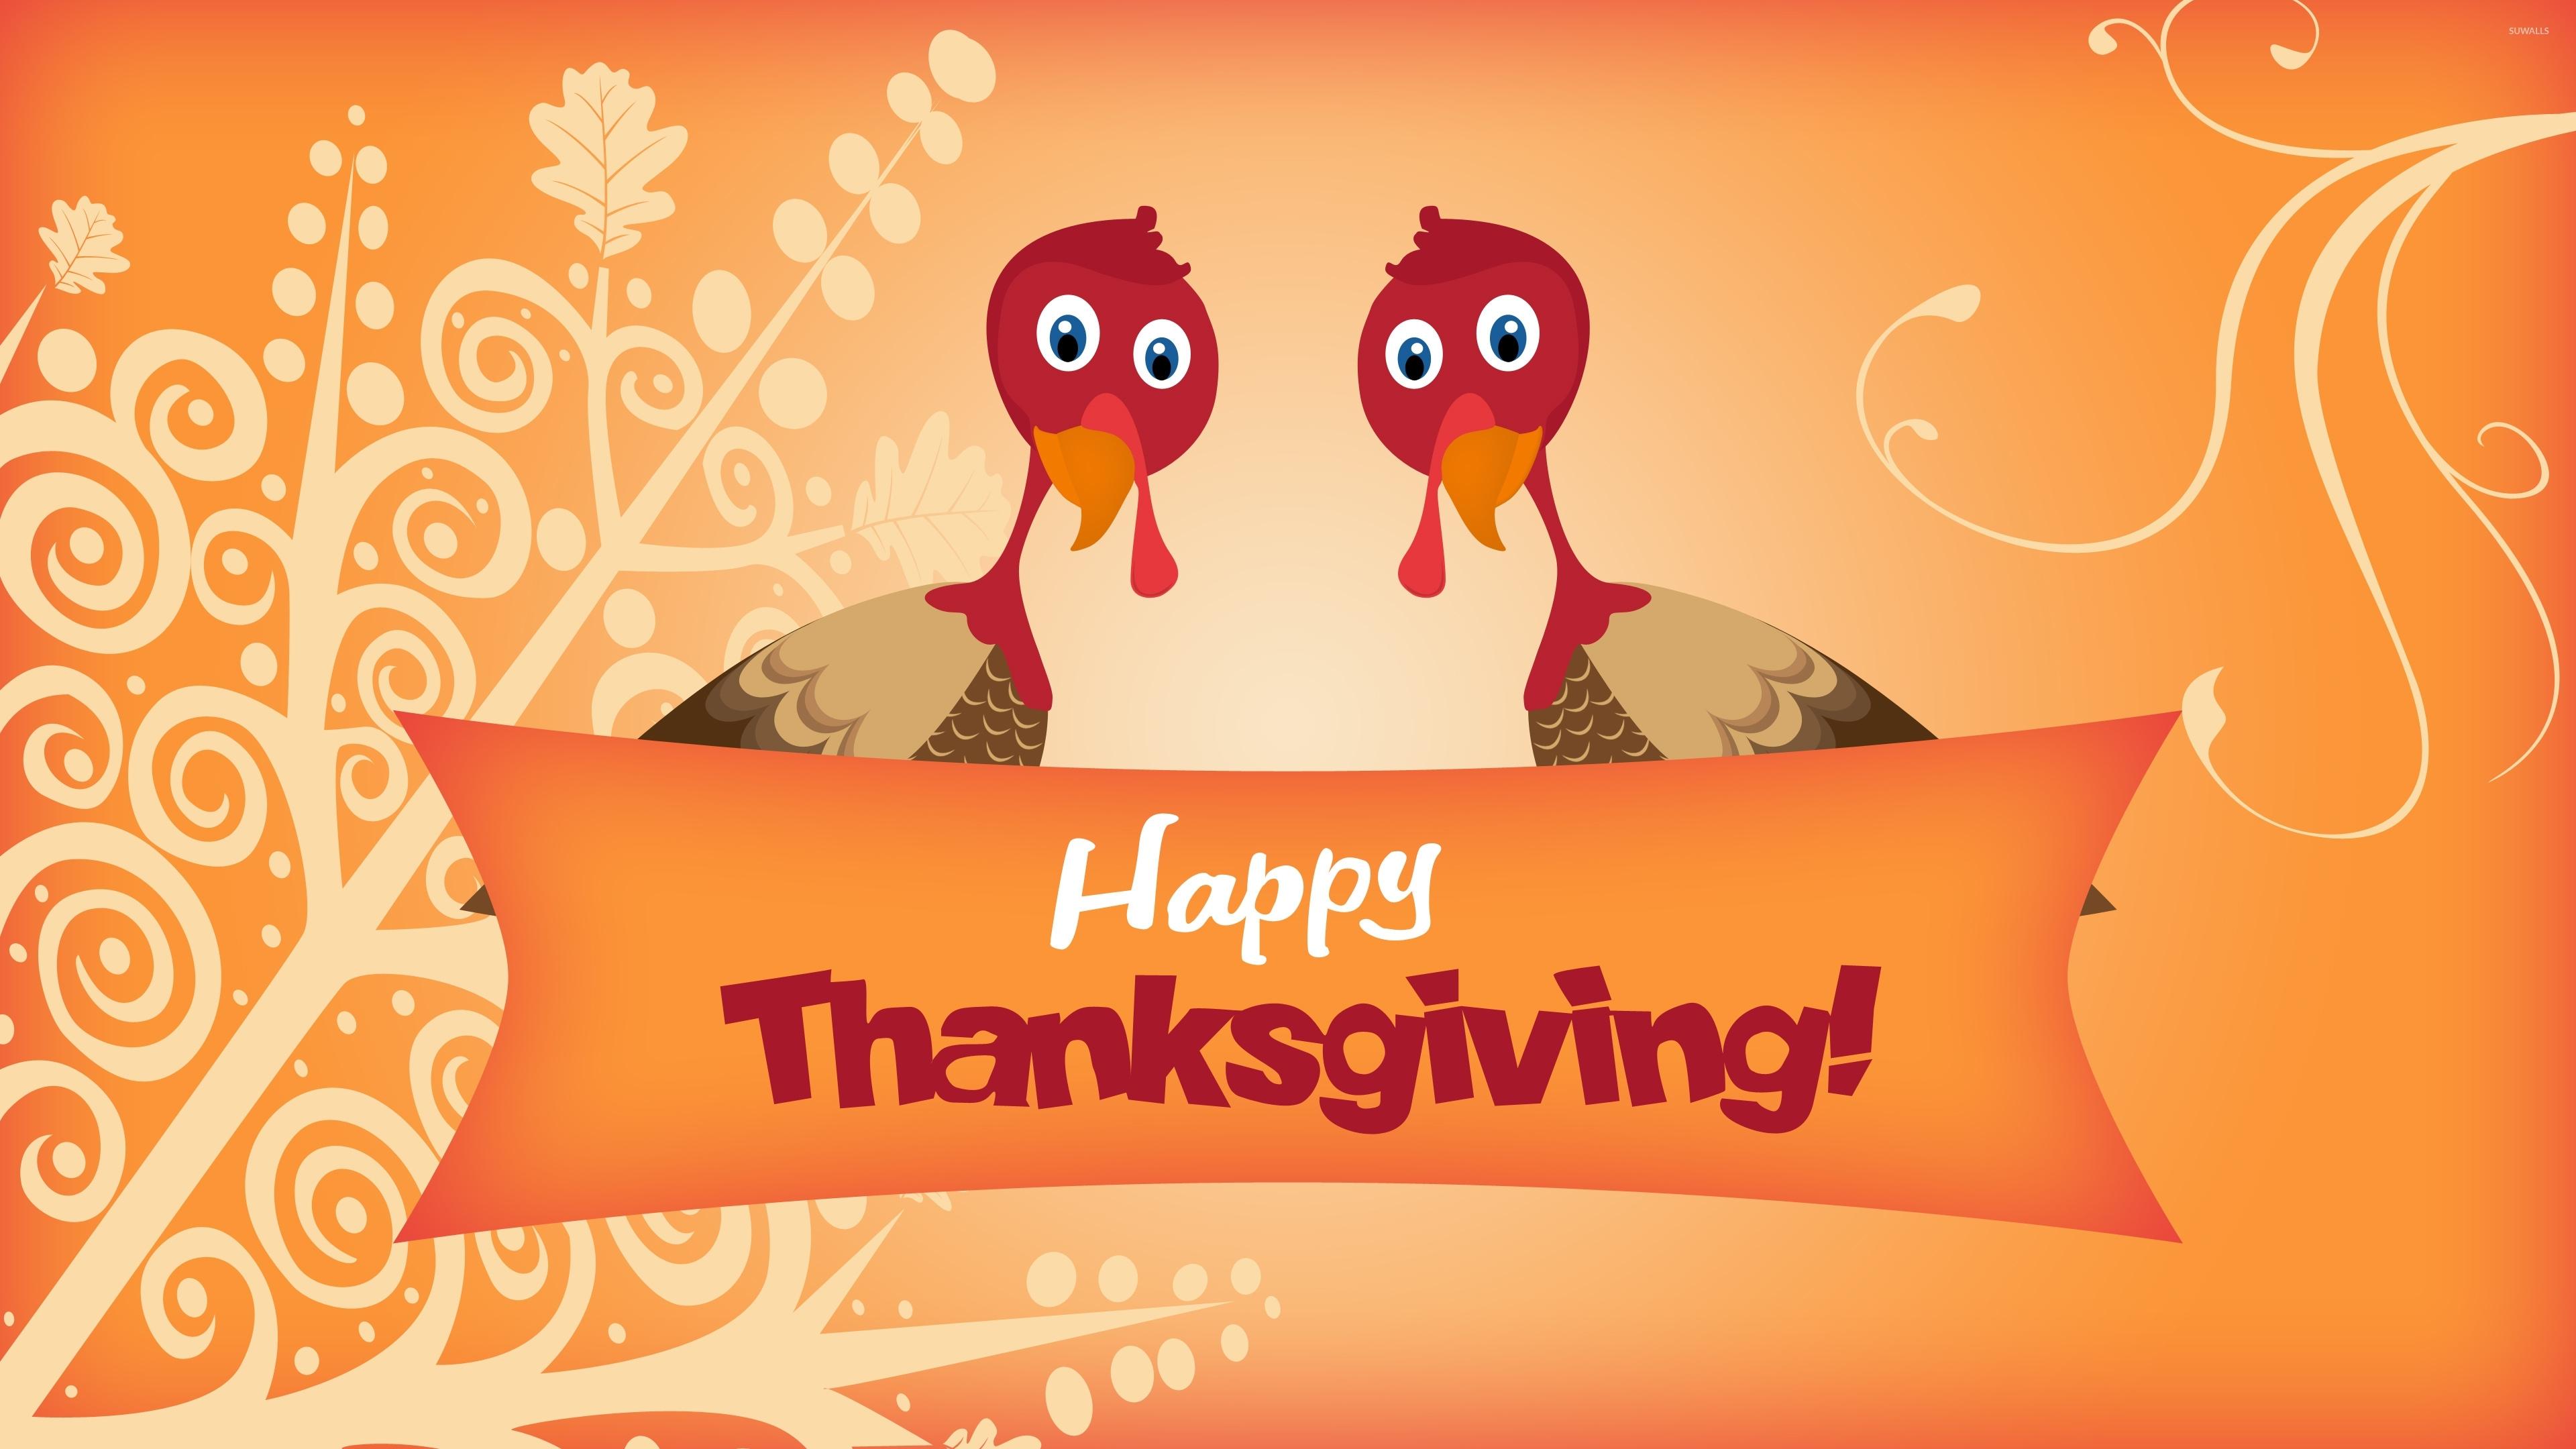 two turkeys wishing you happy thanksgiving wallpaper - holiday